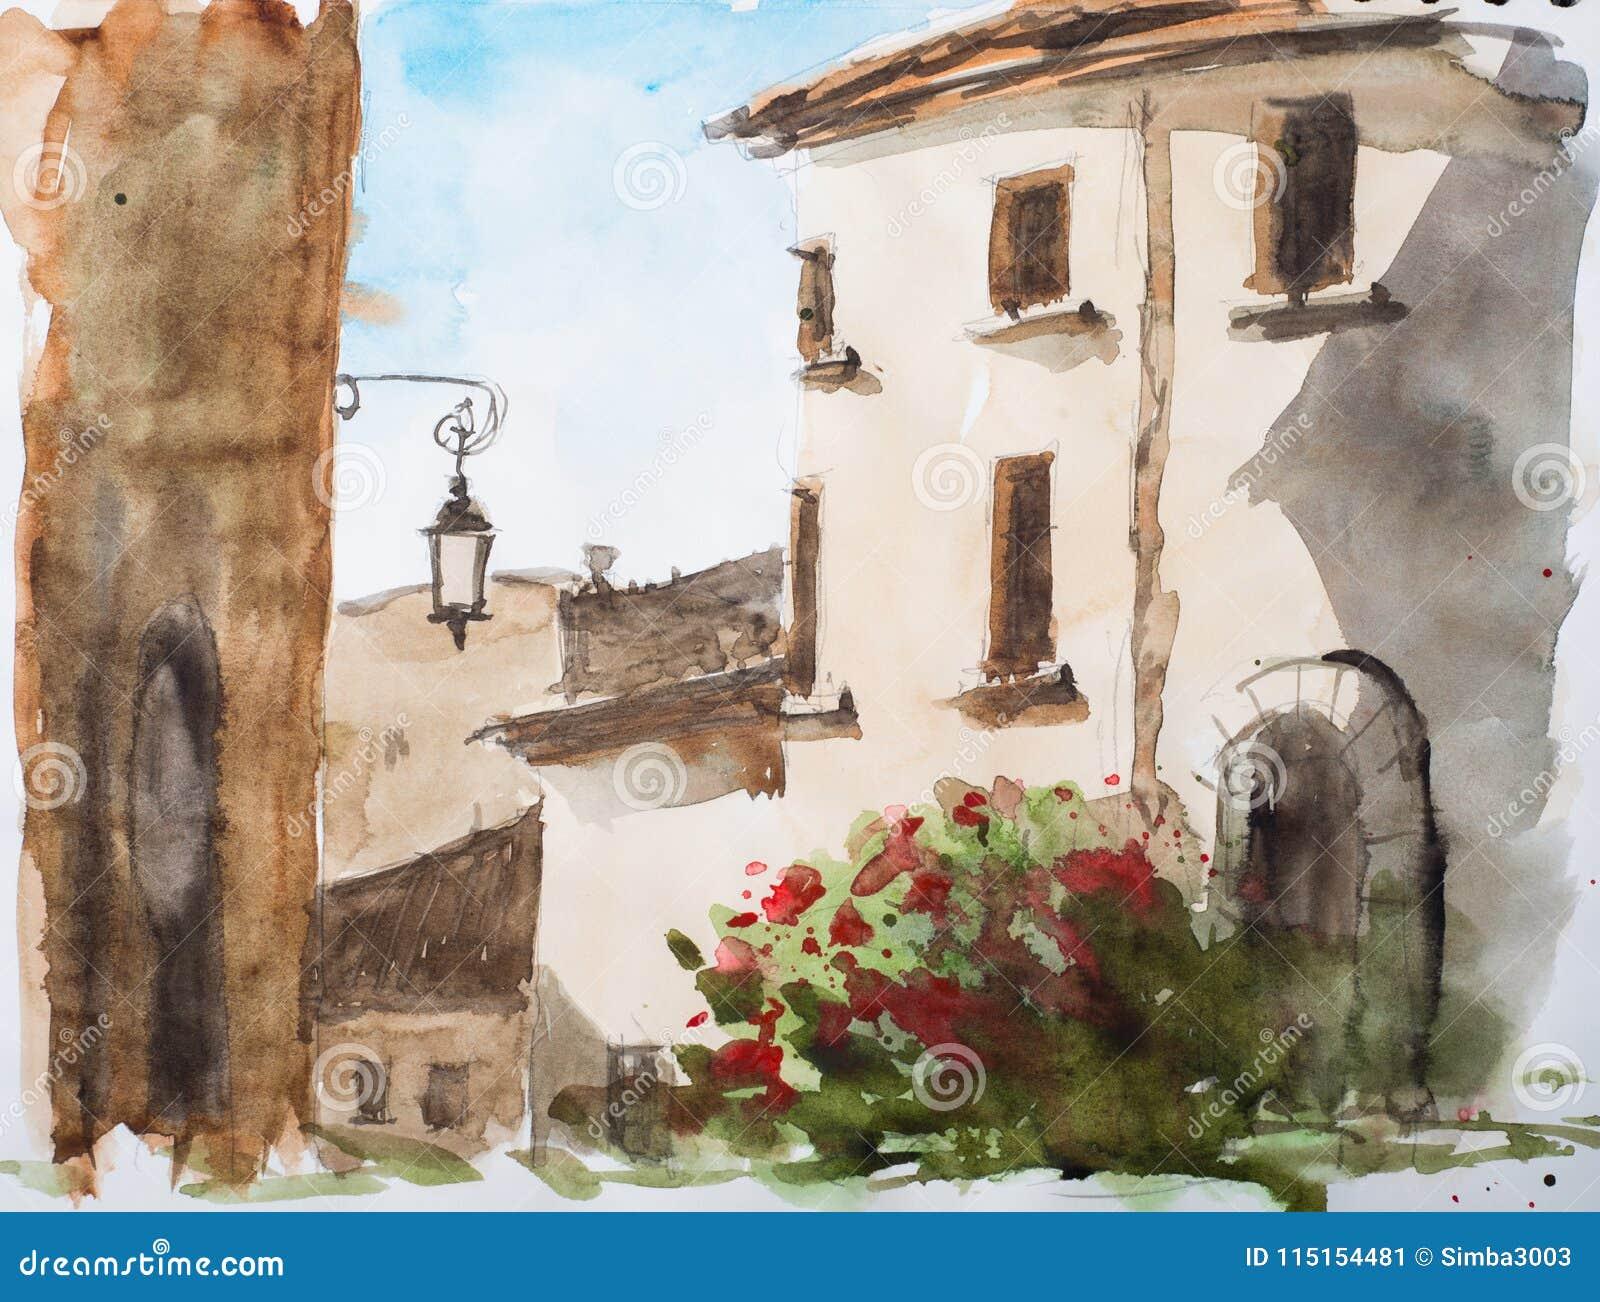 La petite ville en Sardaigne